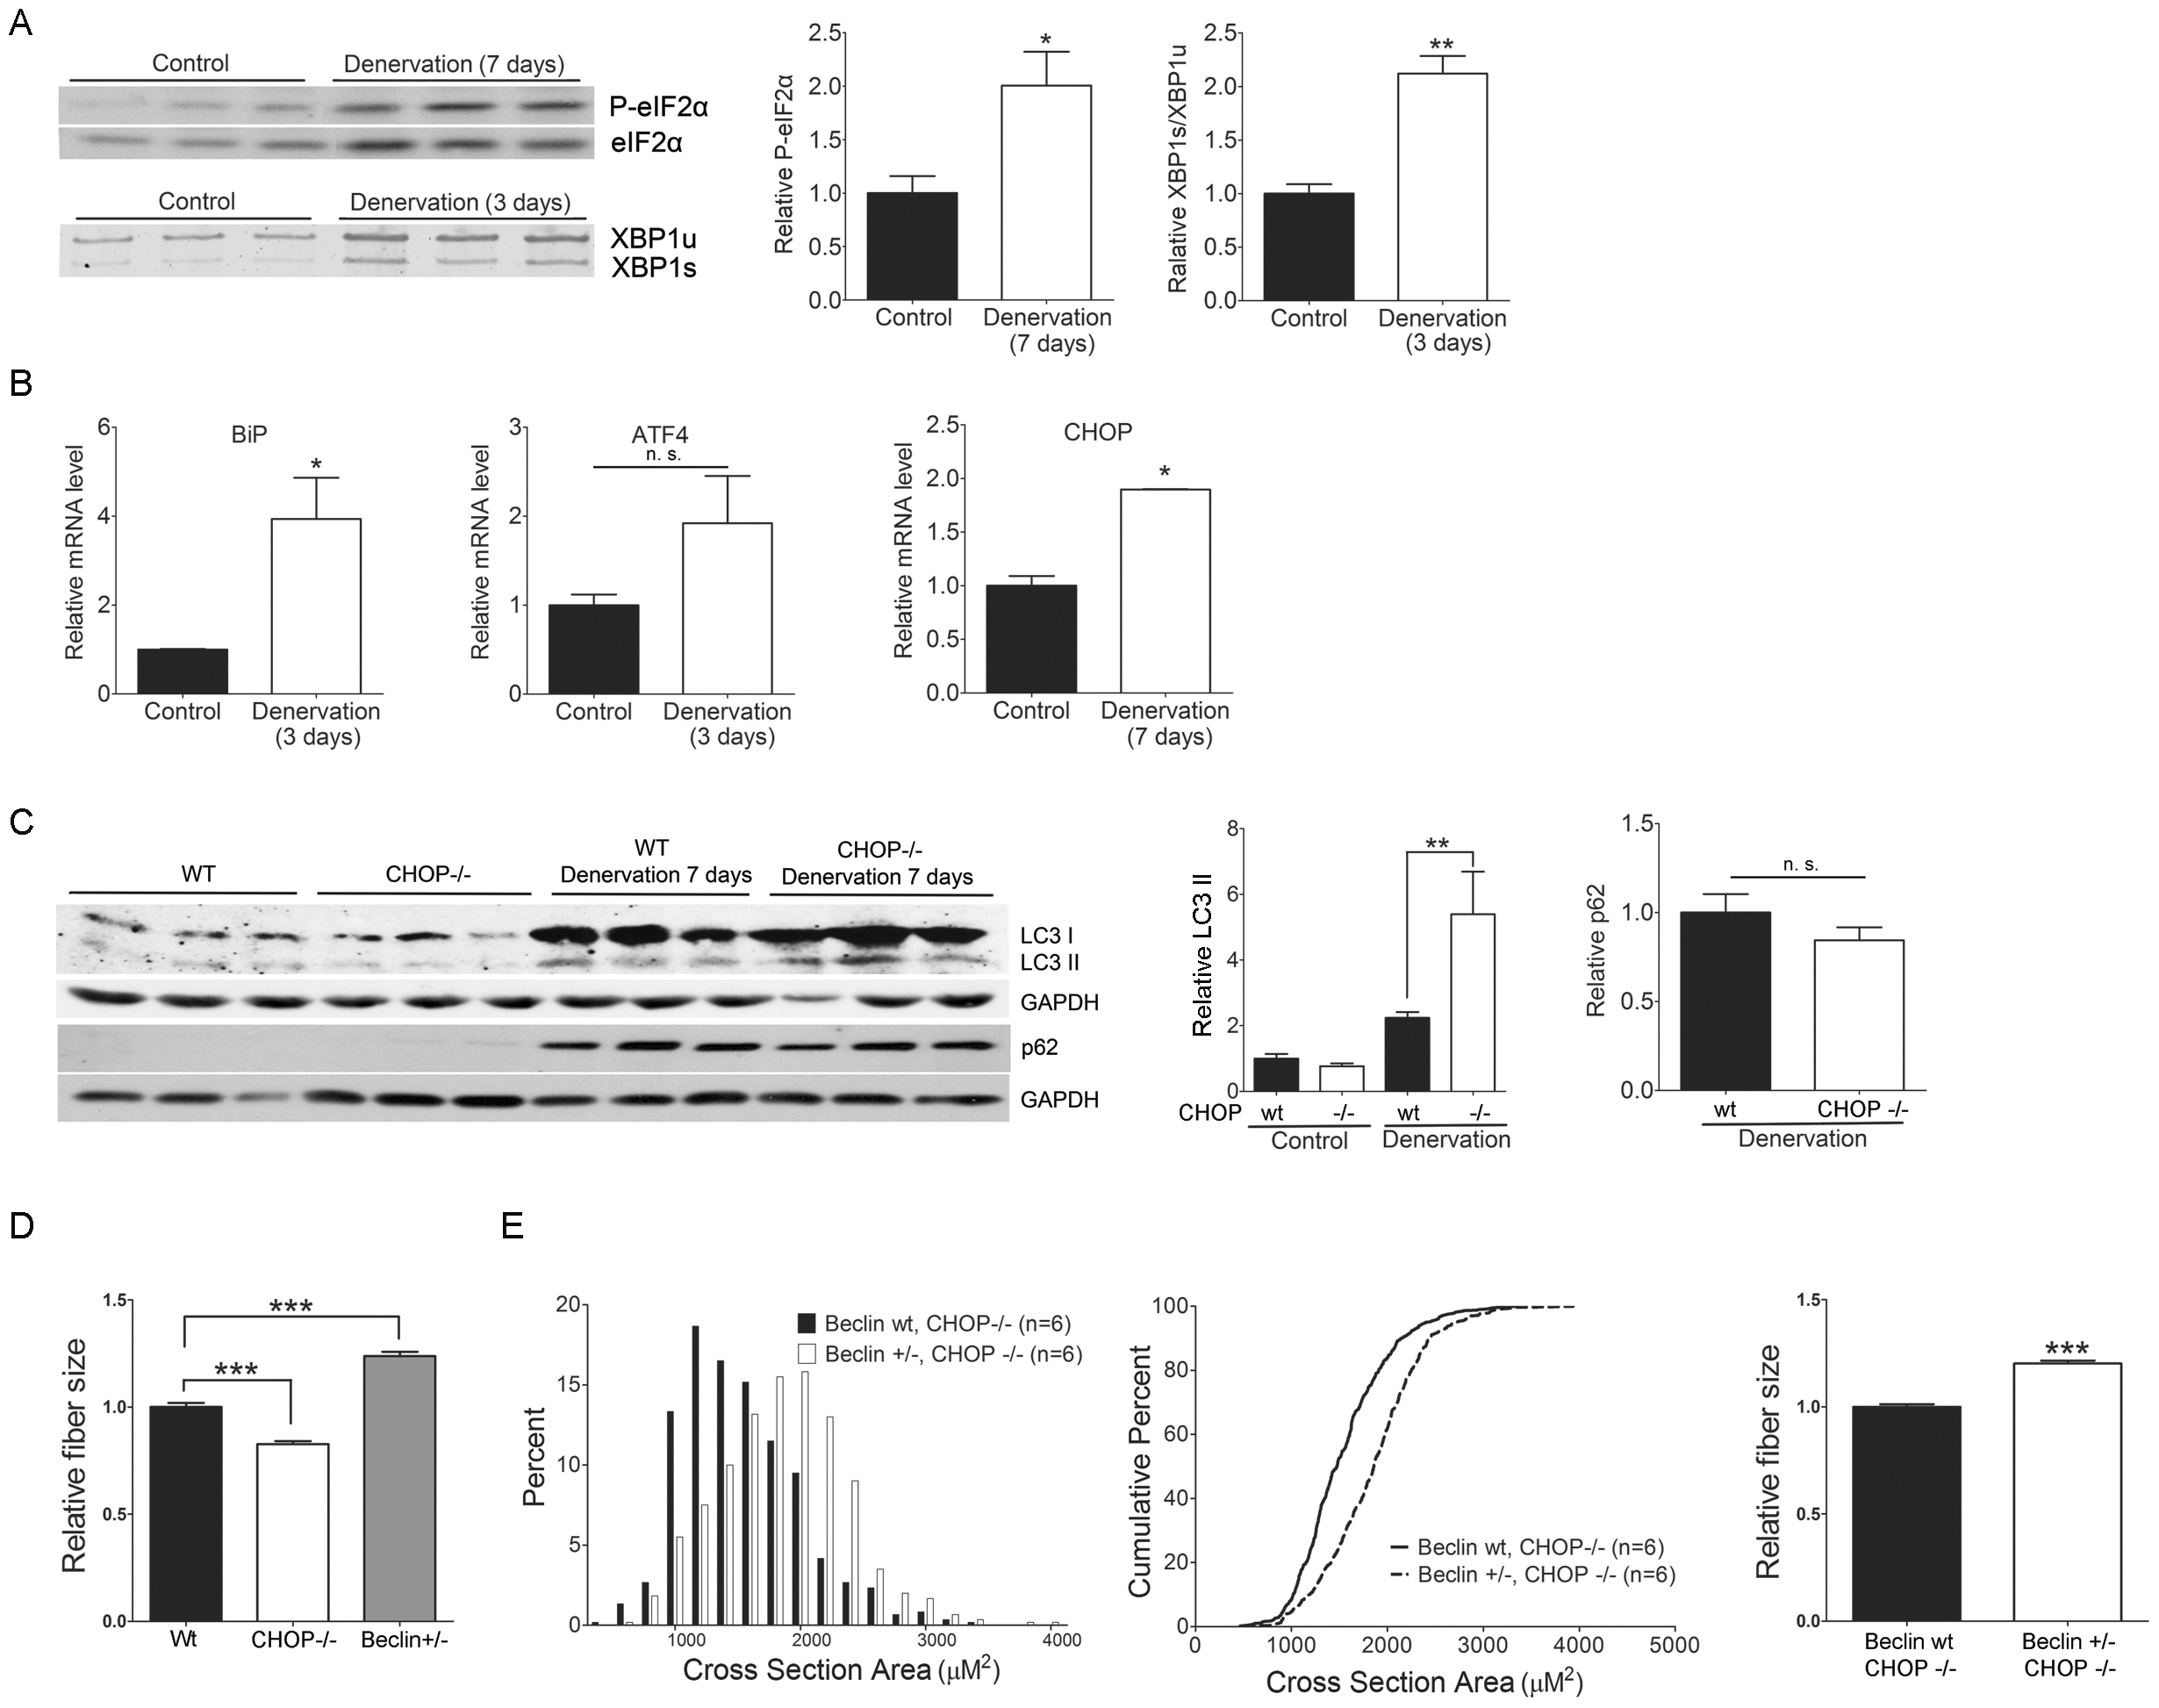 CHOP deficiency increases denervation-induced atrophy through autophagy.